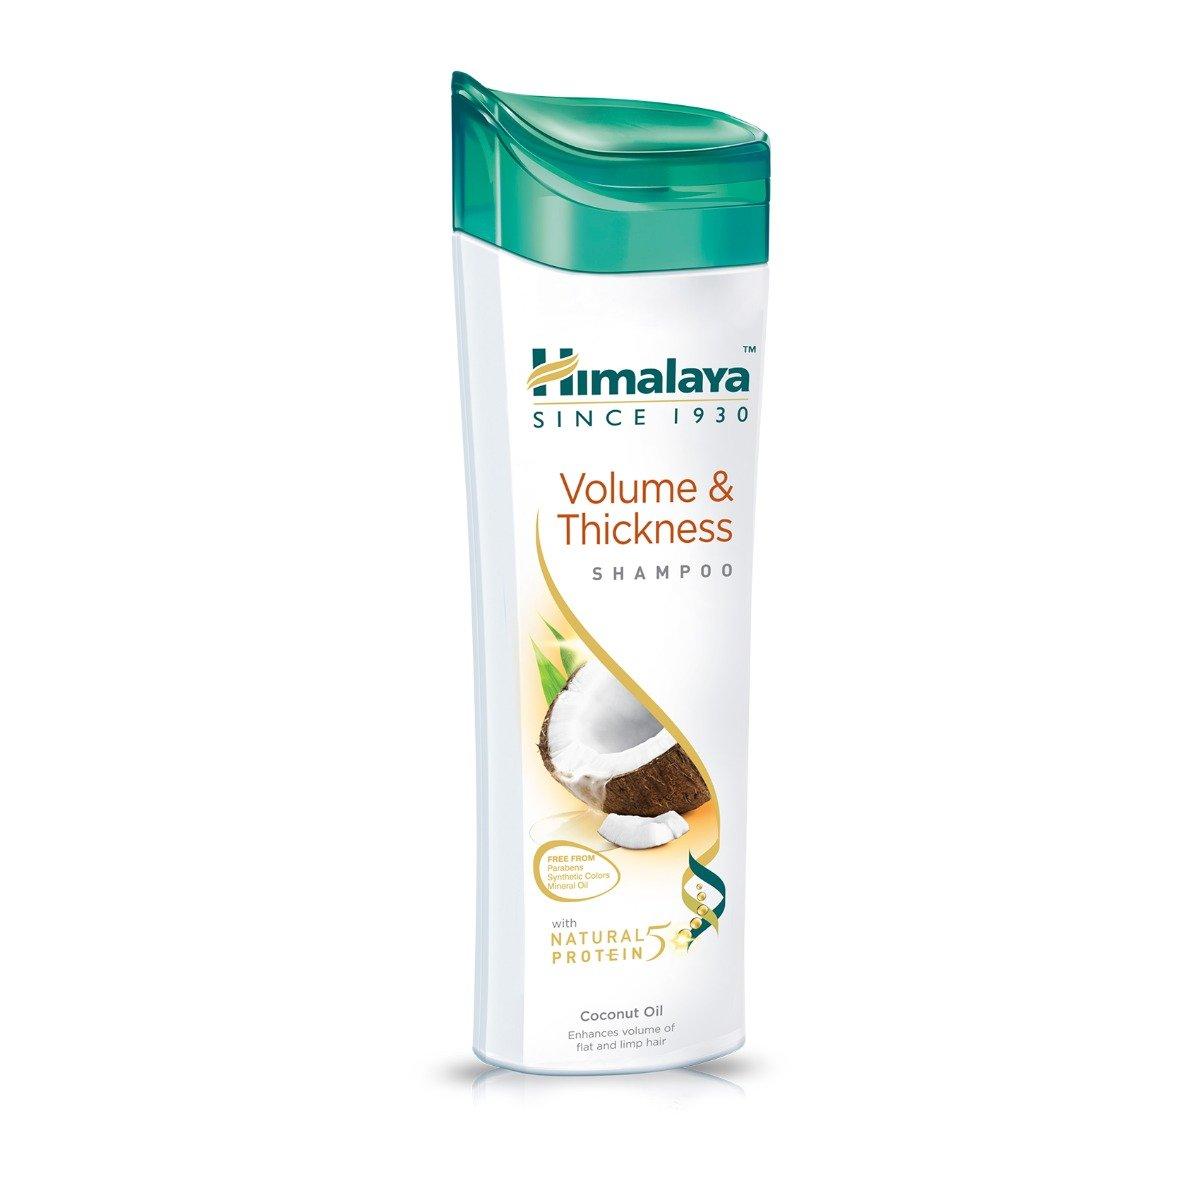 Sampon Himalaya Volume & Thickness, 200 ml